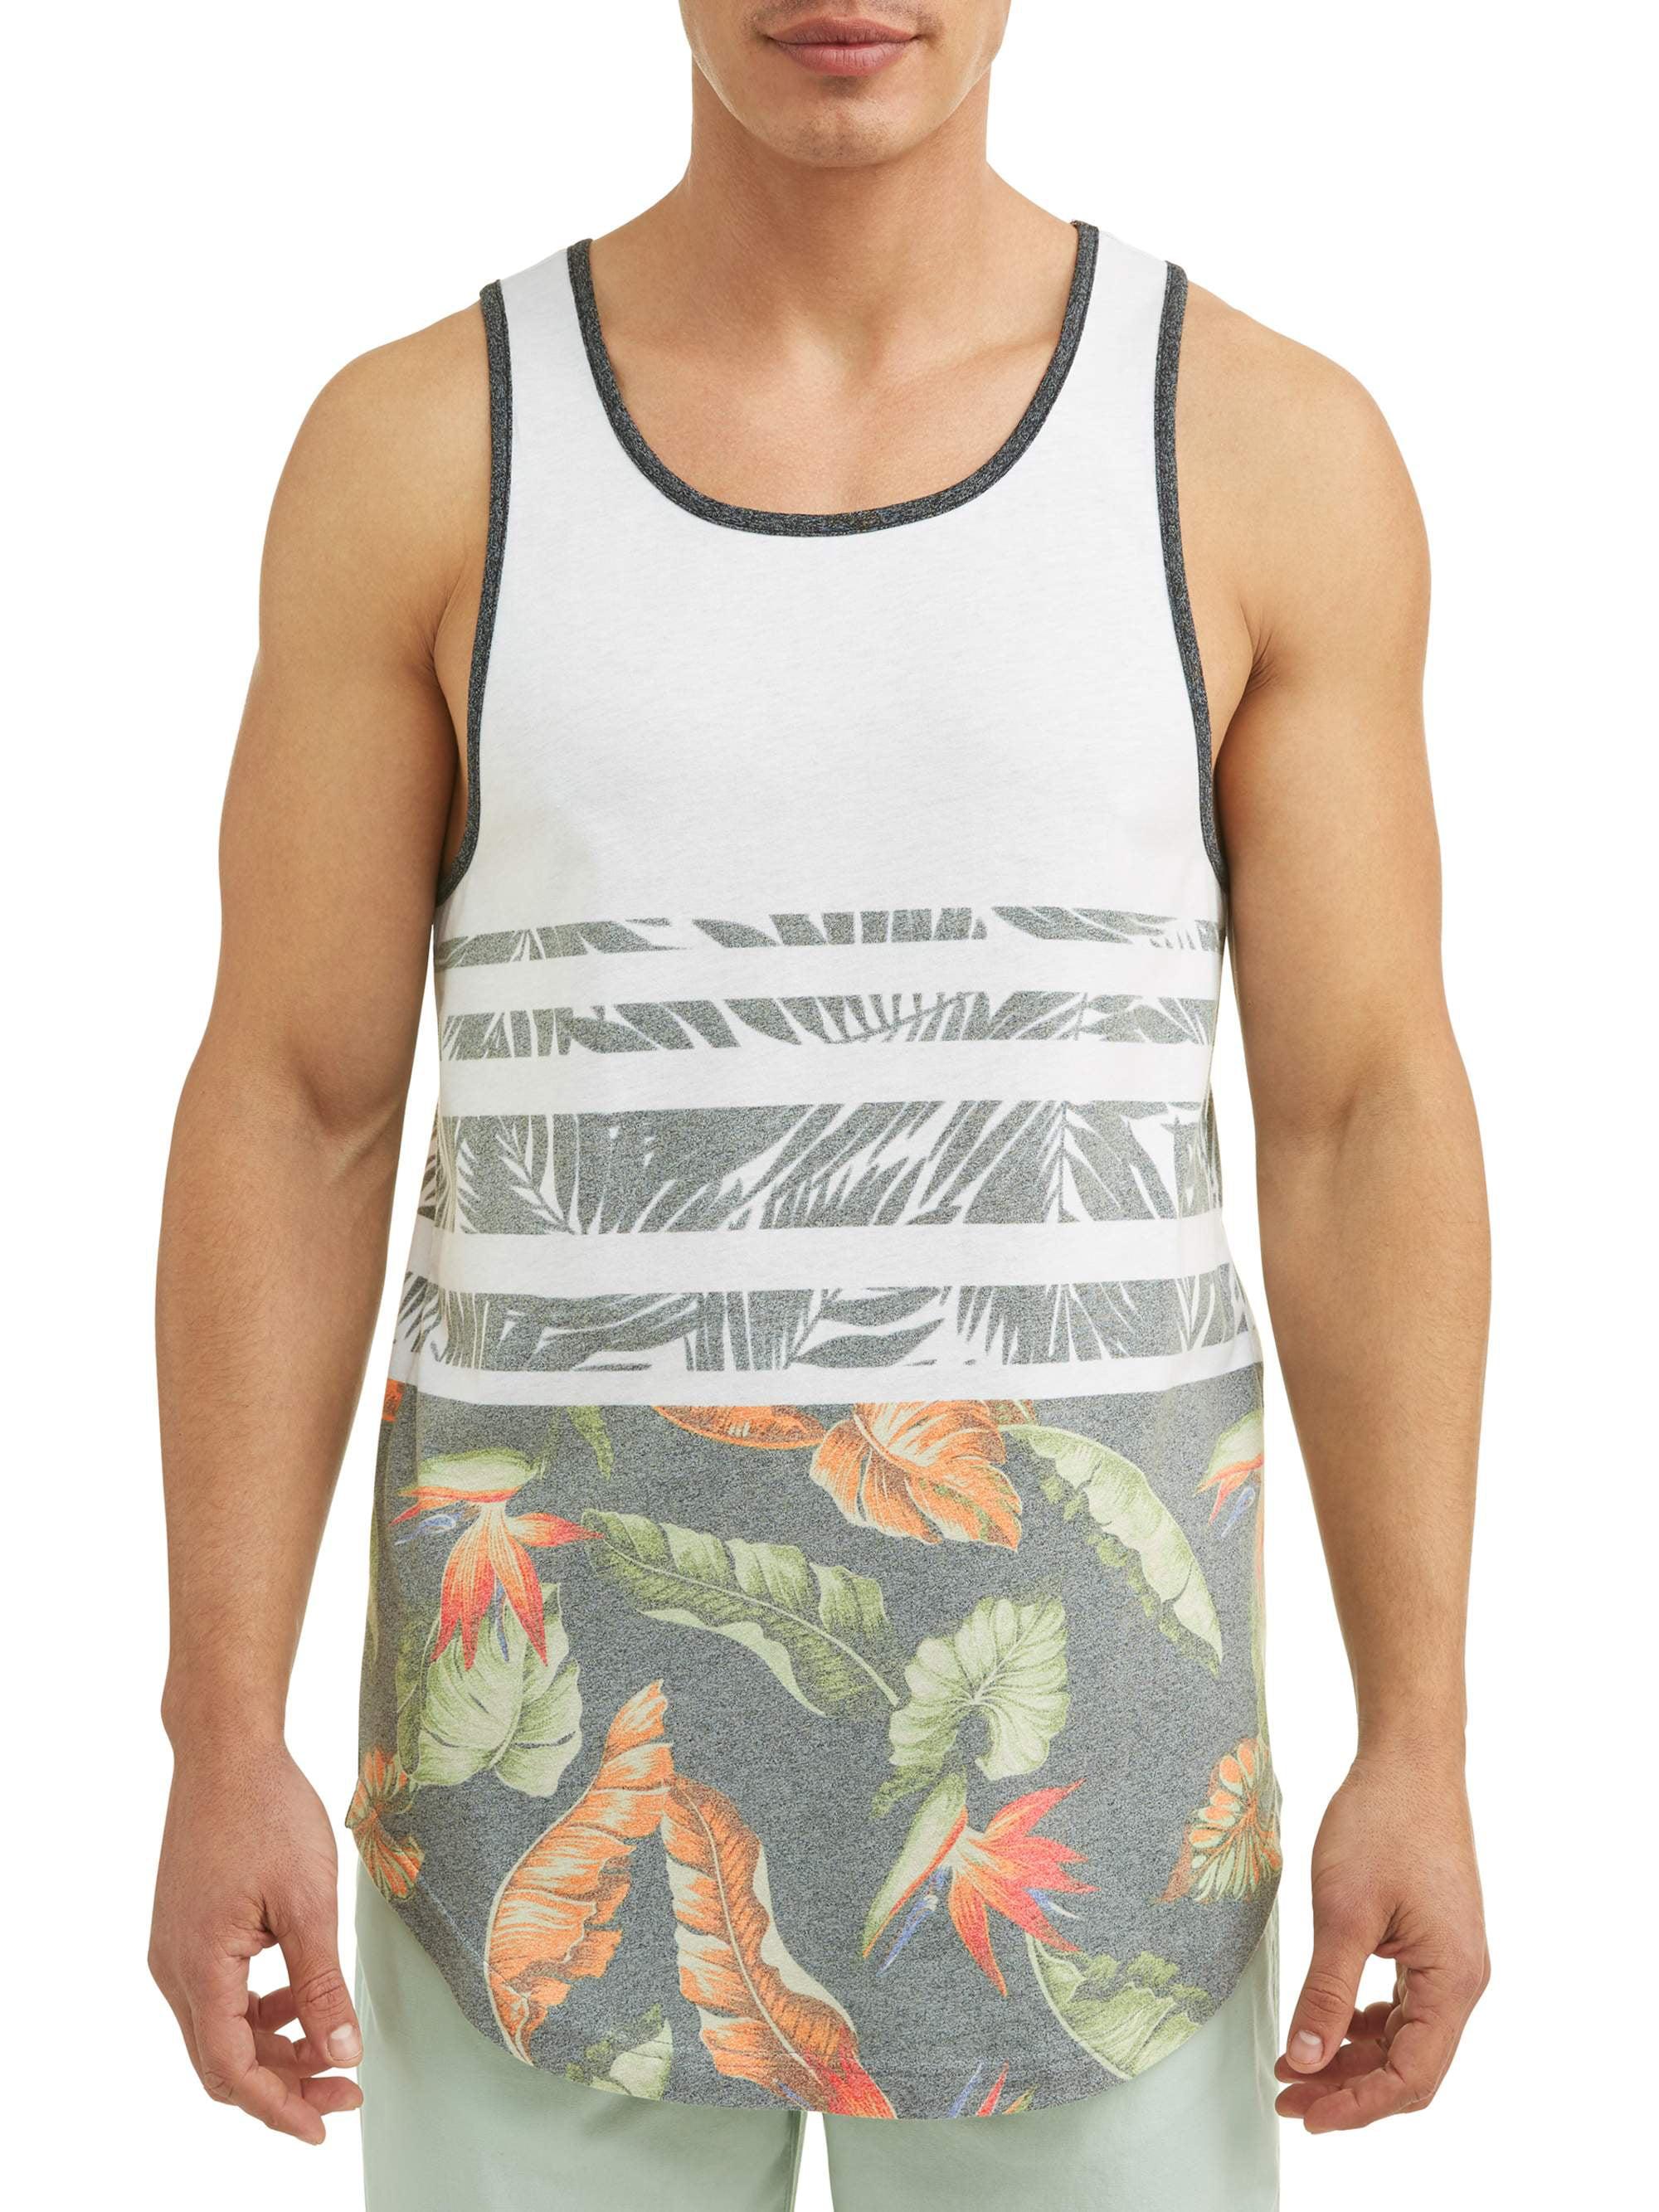 Hip Hop T Shirt Men Donci Rap Dancing Loose Large Size Fashion Tees